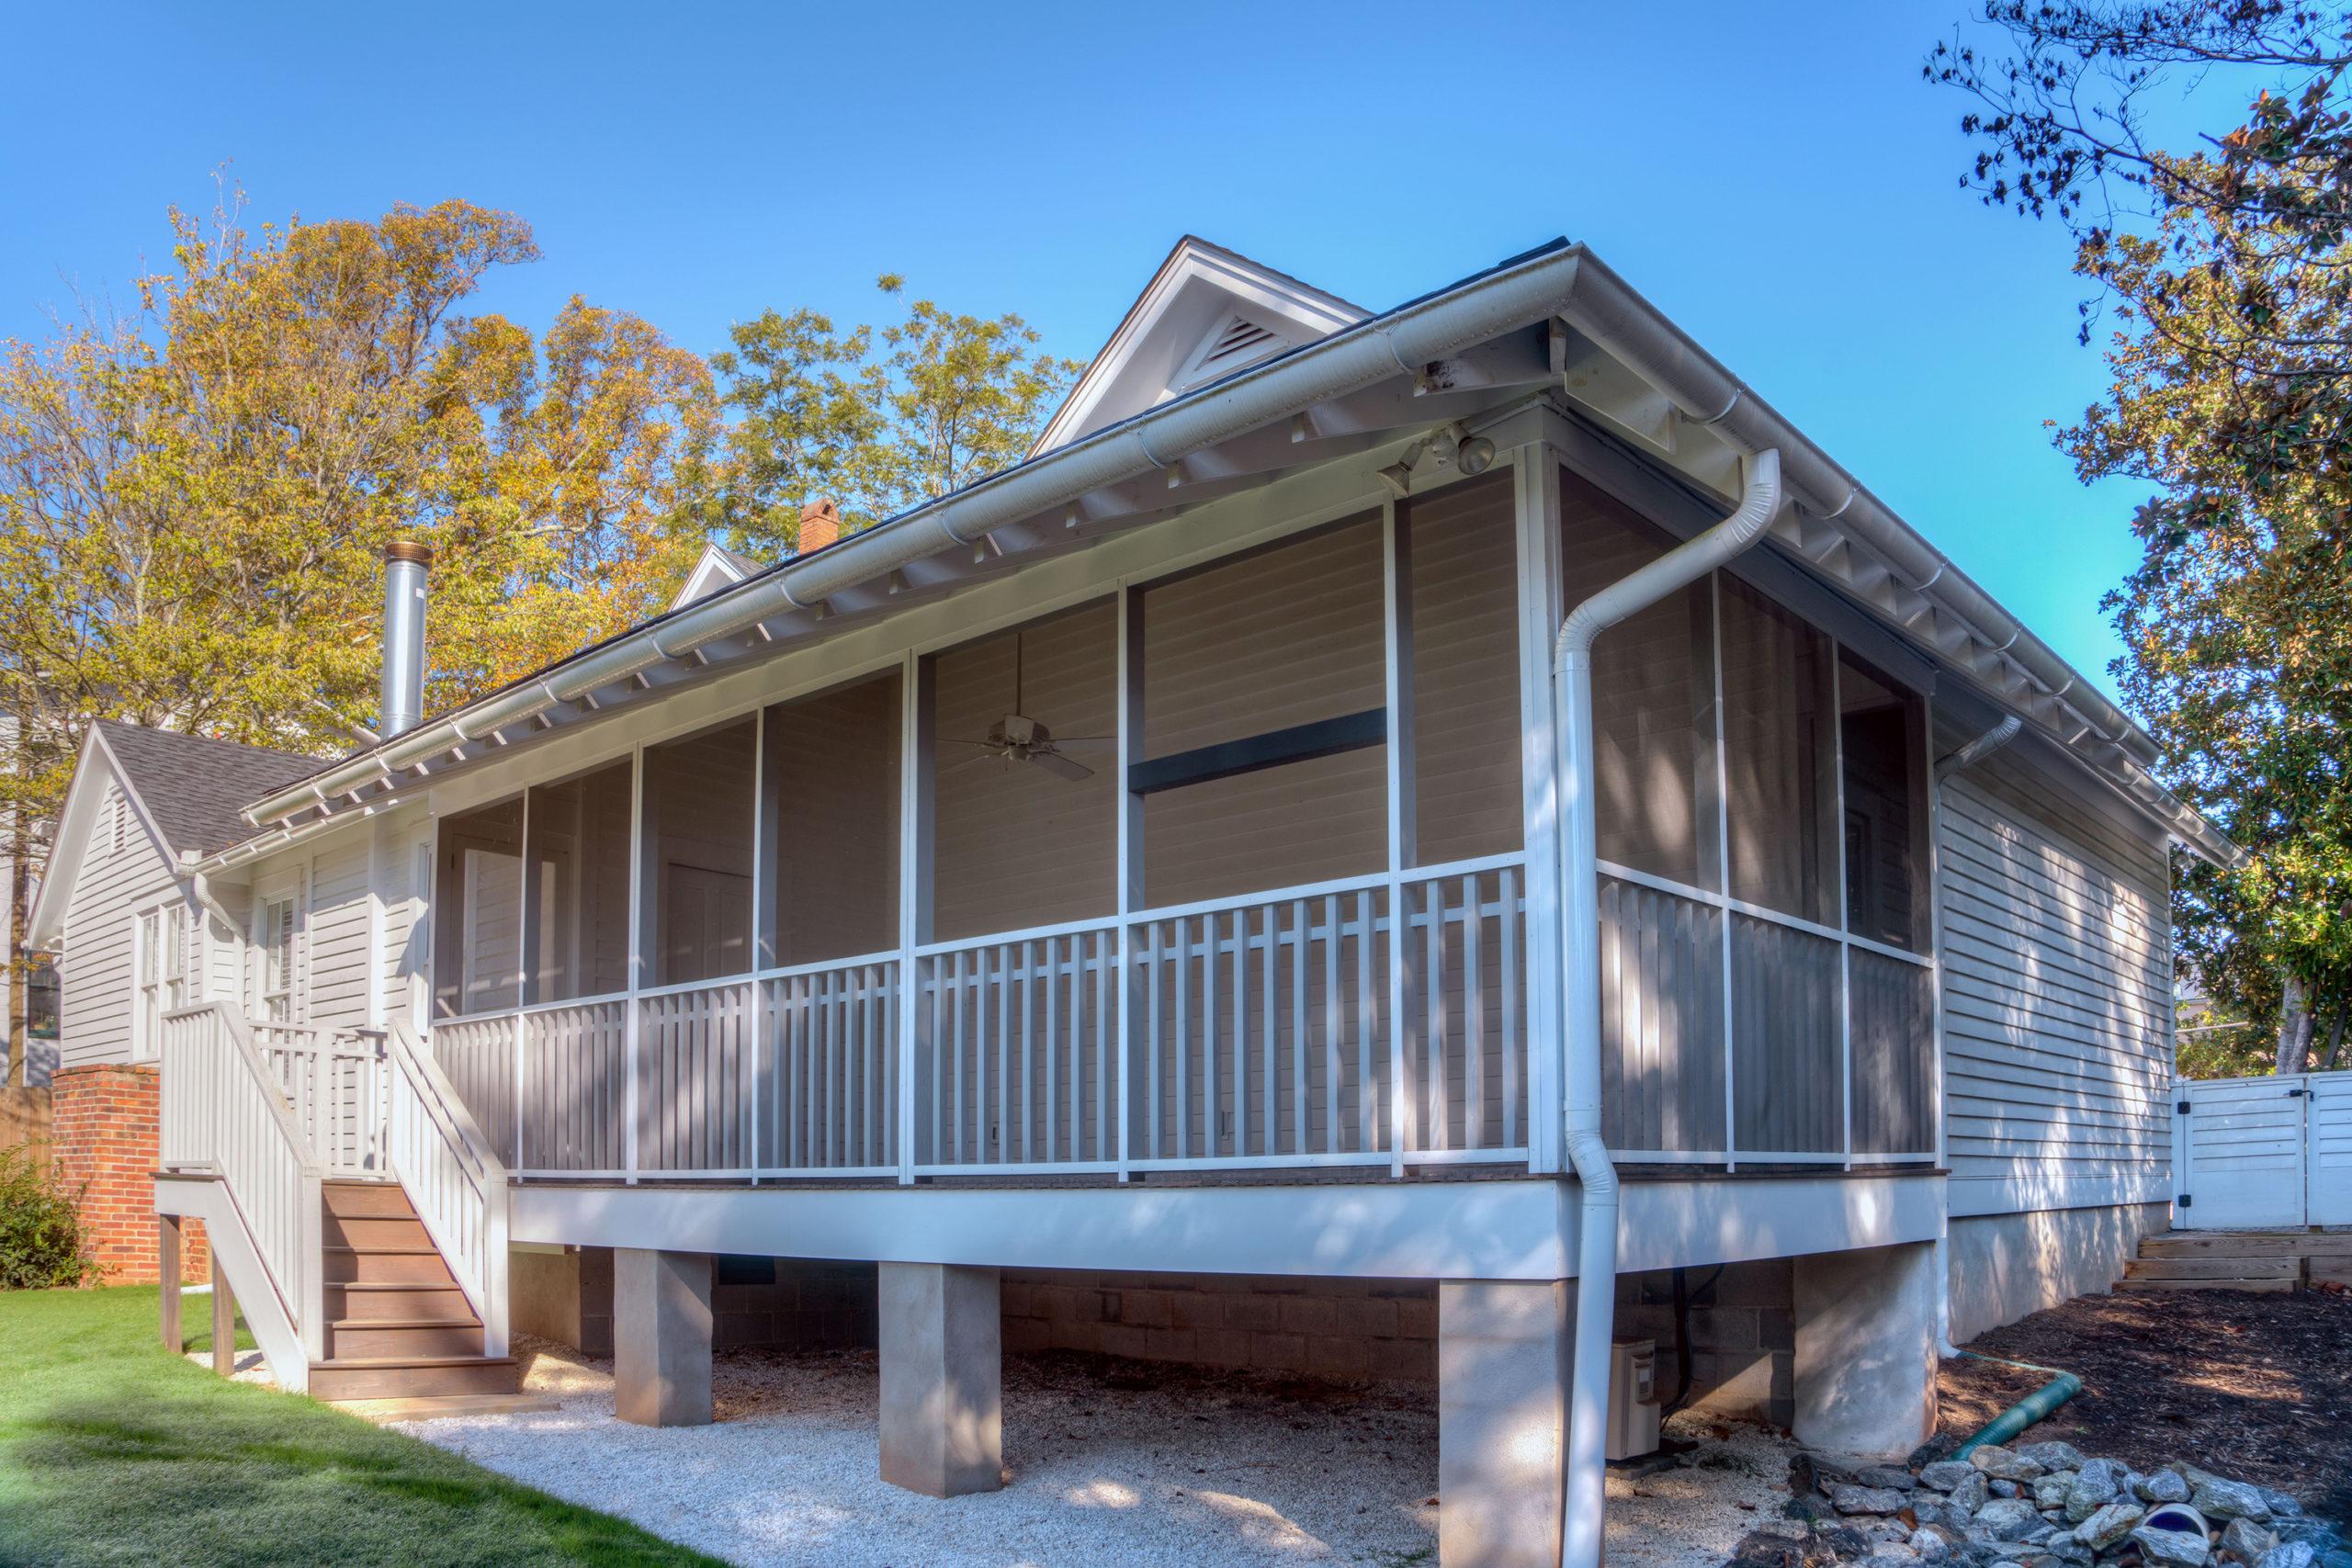 Rear porch addition